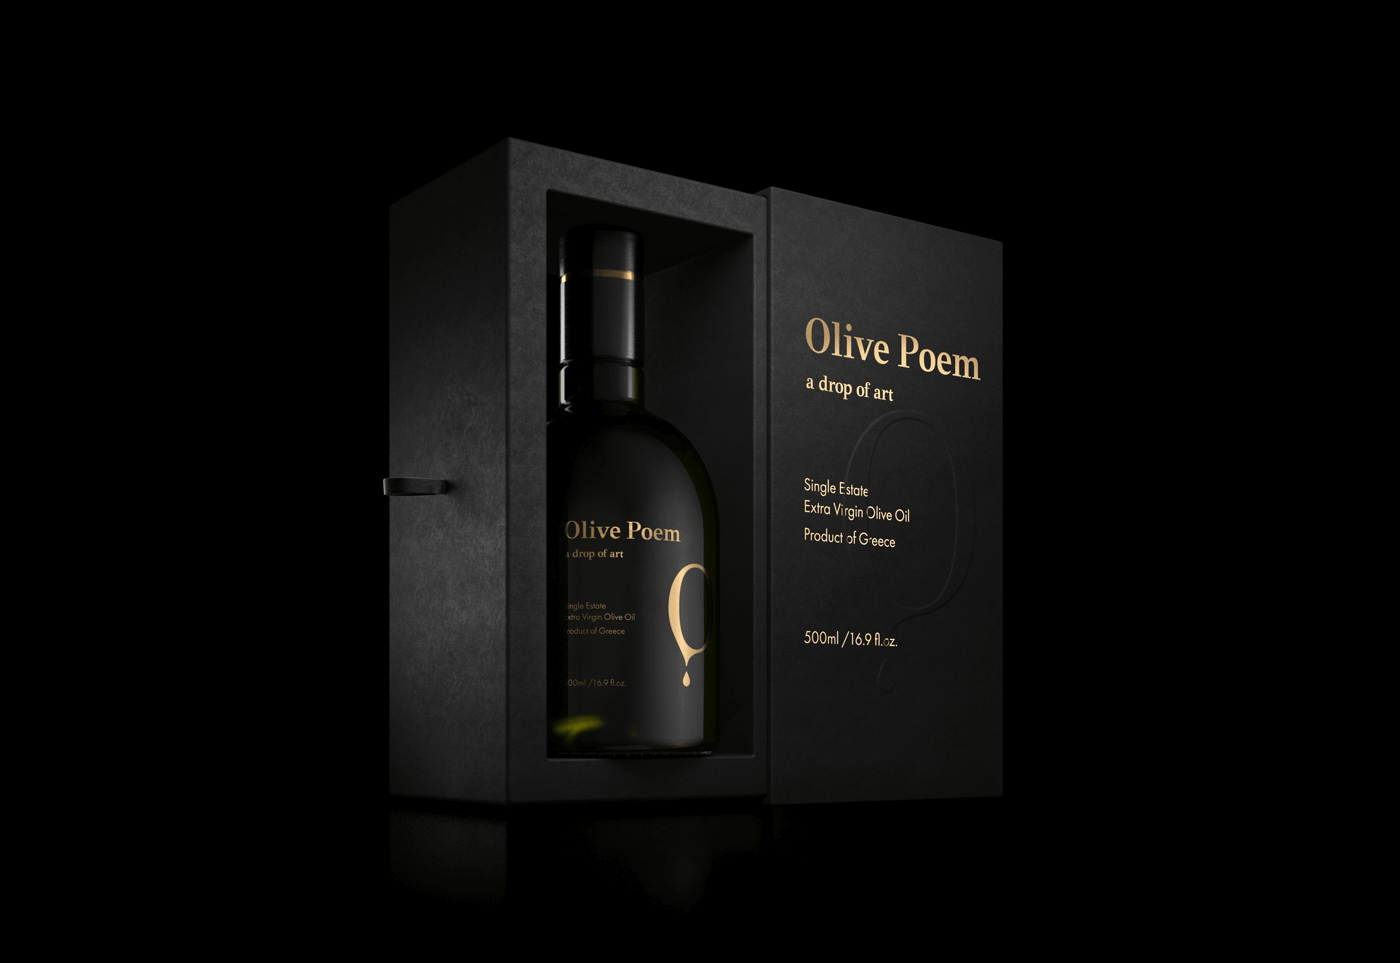 Bouteille d'huile d'olive dans sa boîte noire Olive Poem